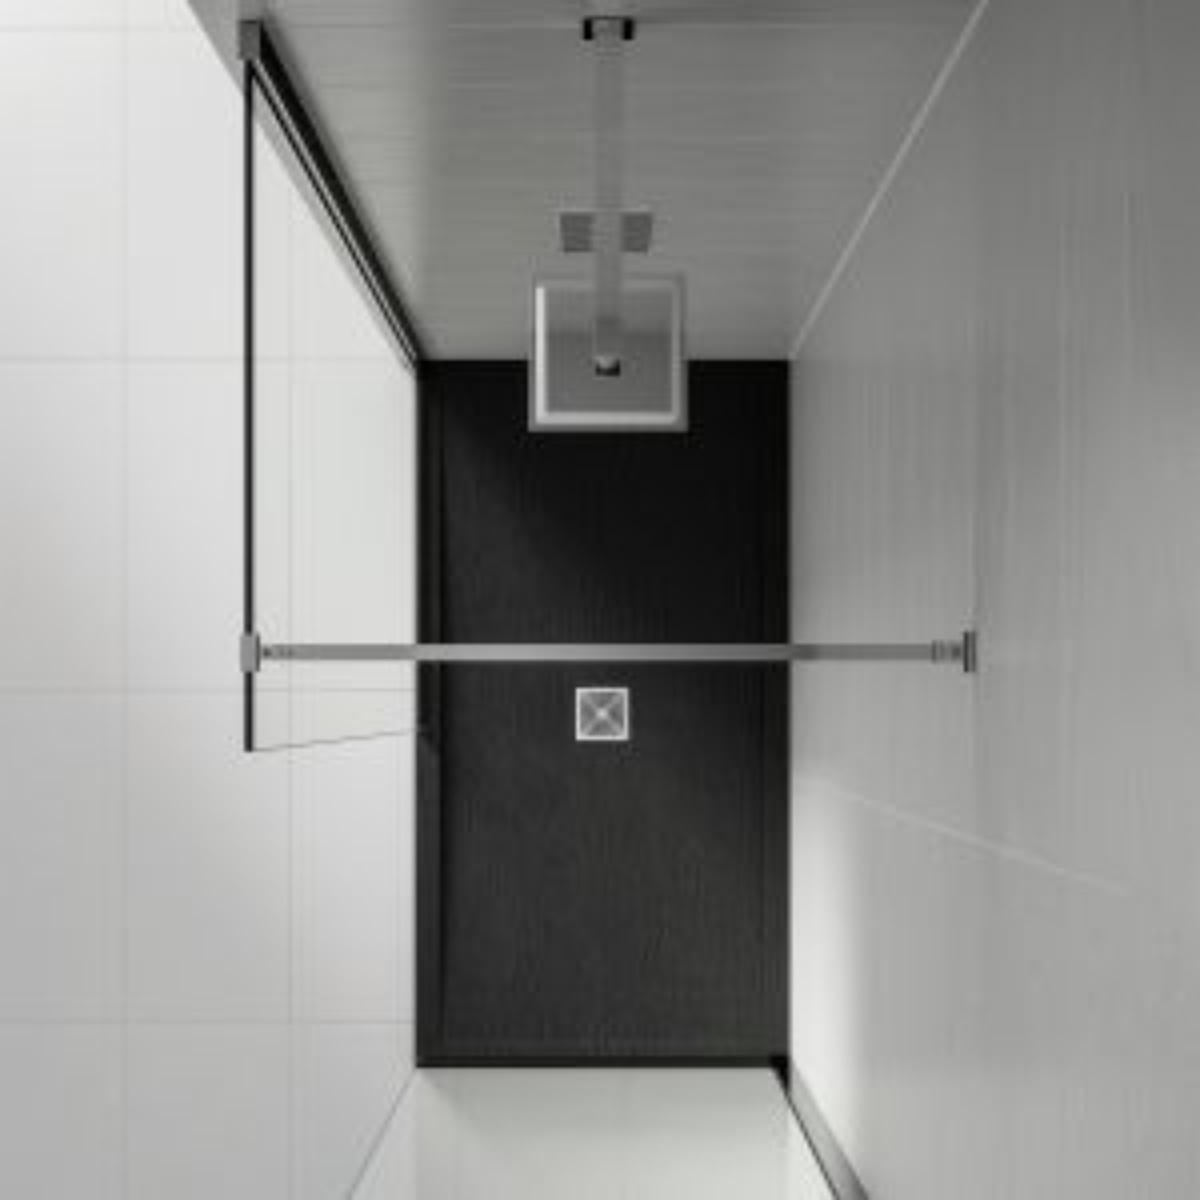 Aquadart Black Slate Shower Tray 1700 x 800 Overhead